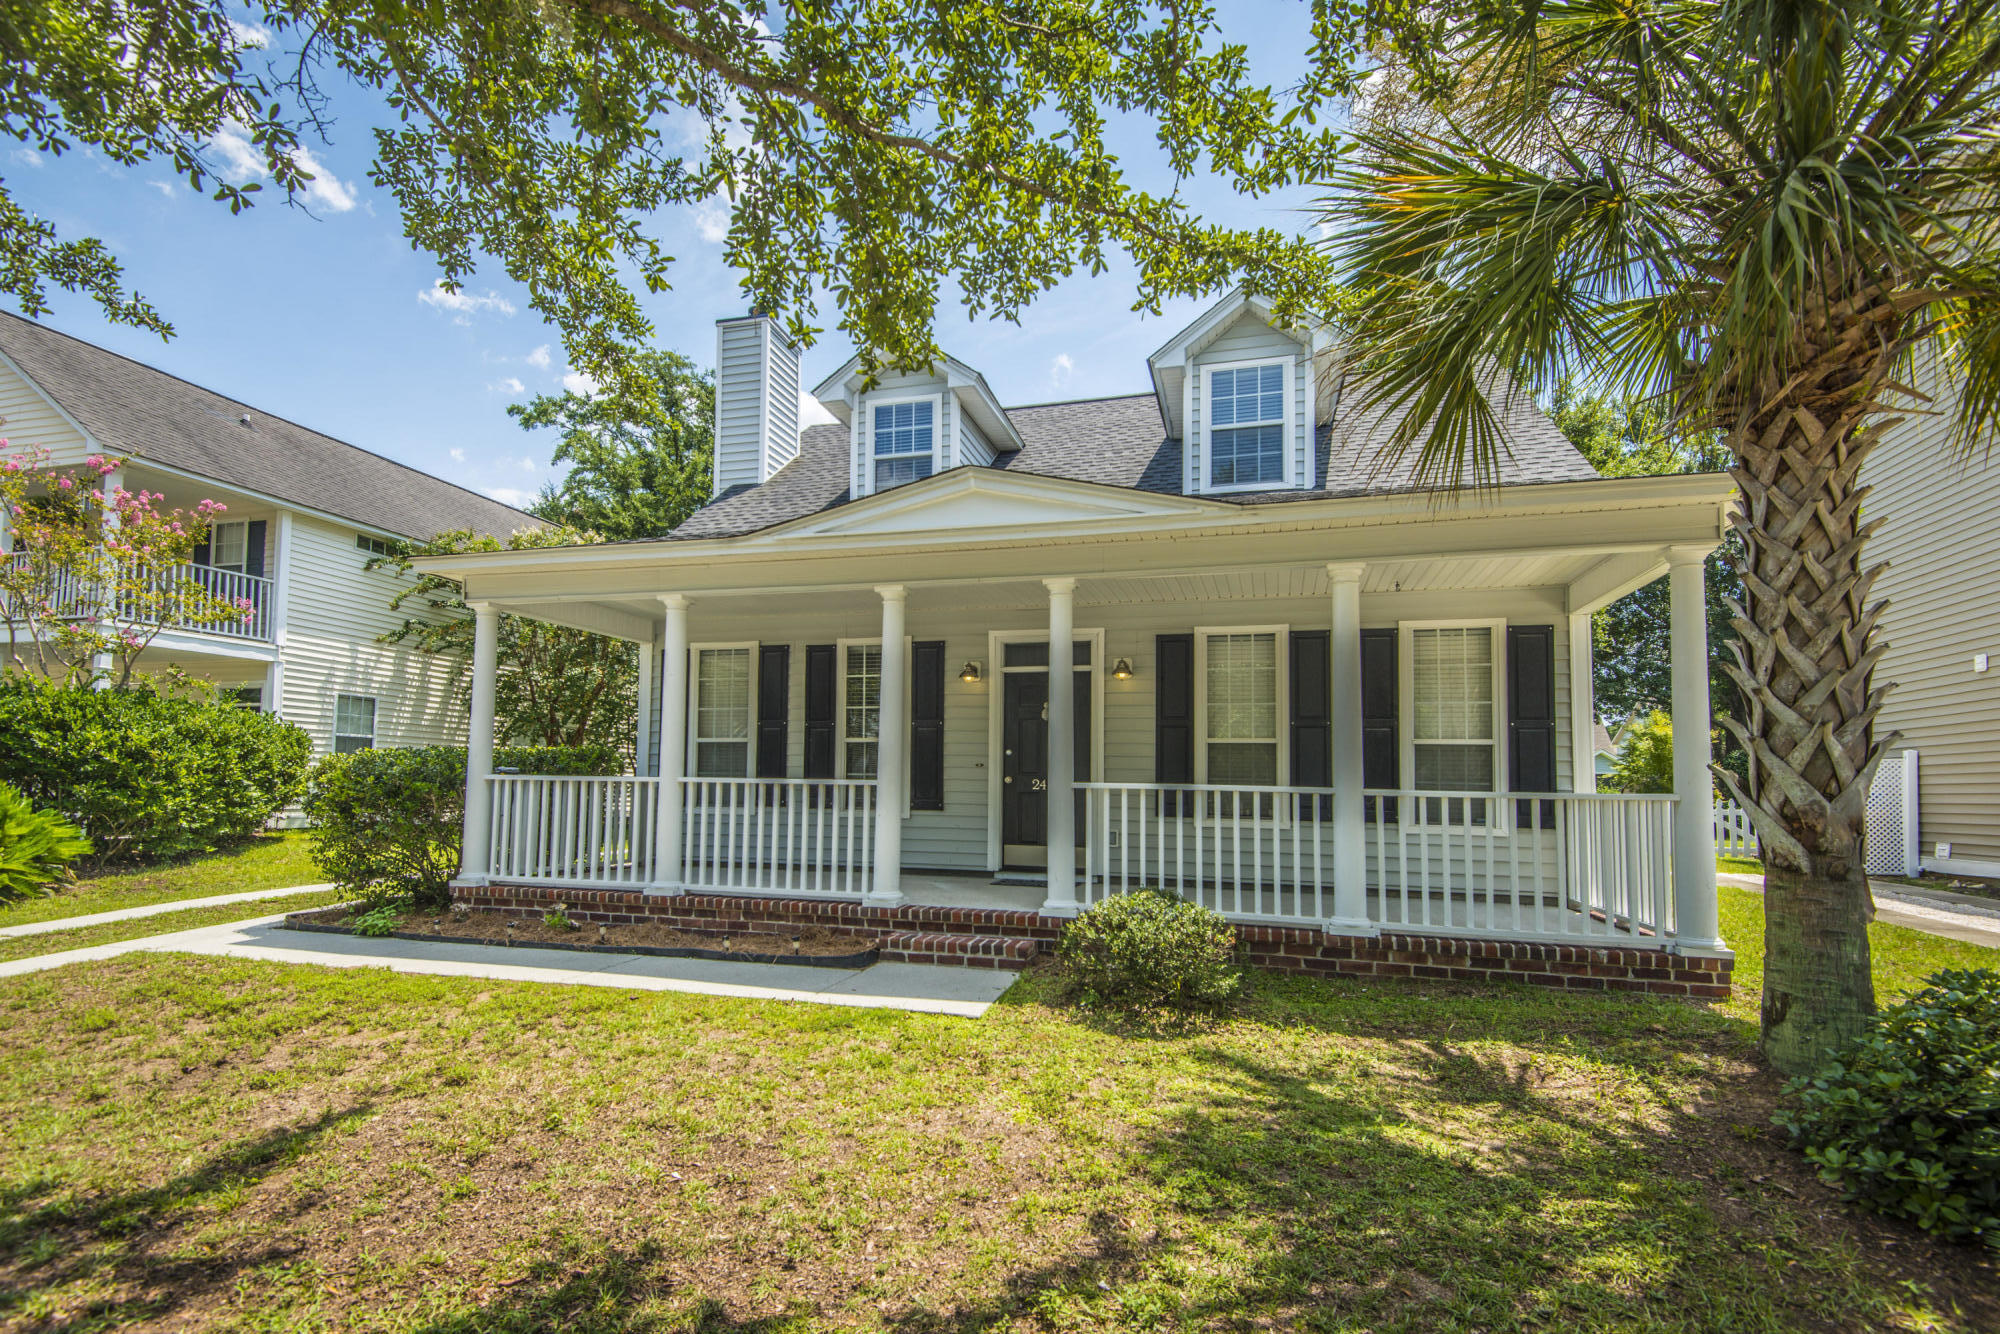 Chadbury Village Homes For Sale - 2461 Fulford, Mount Pleasant, SC - 11